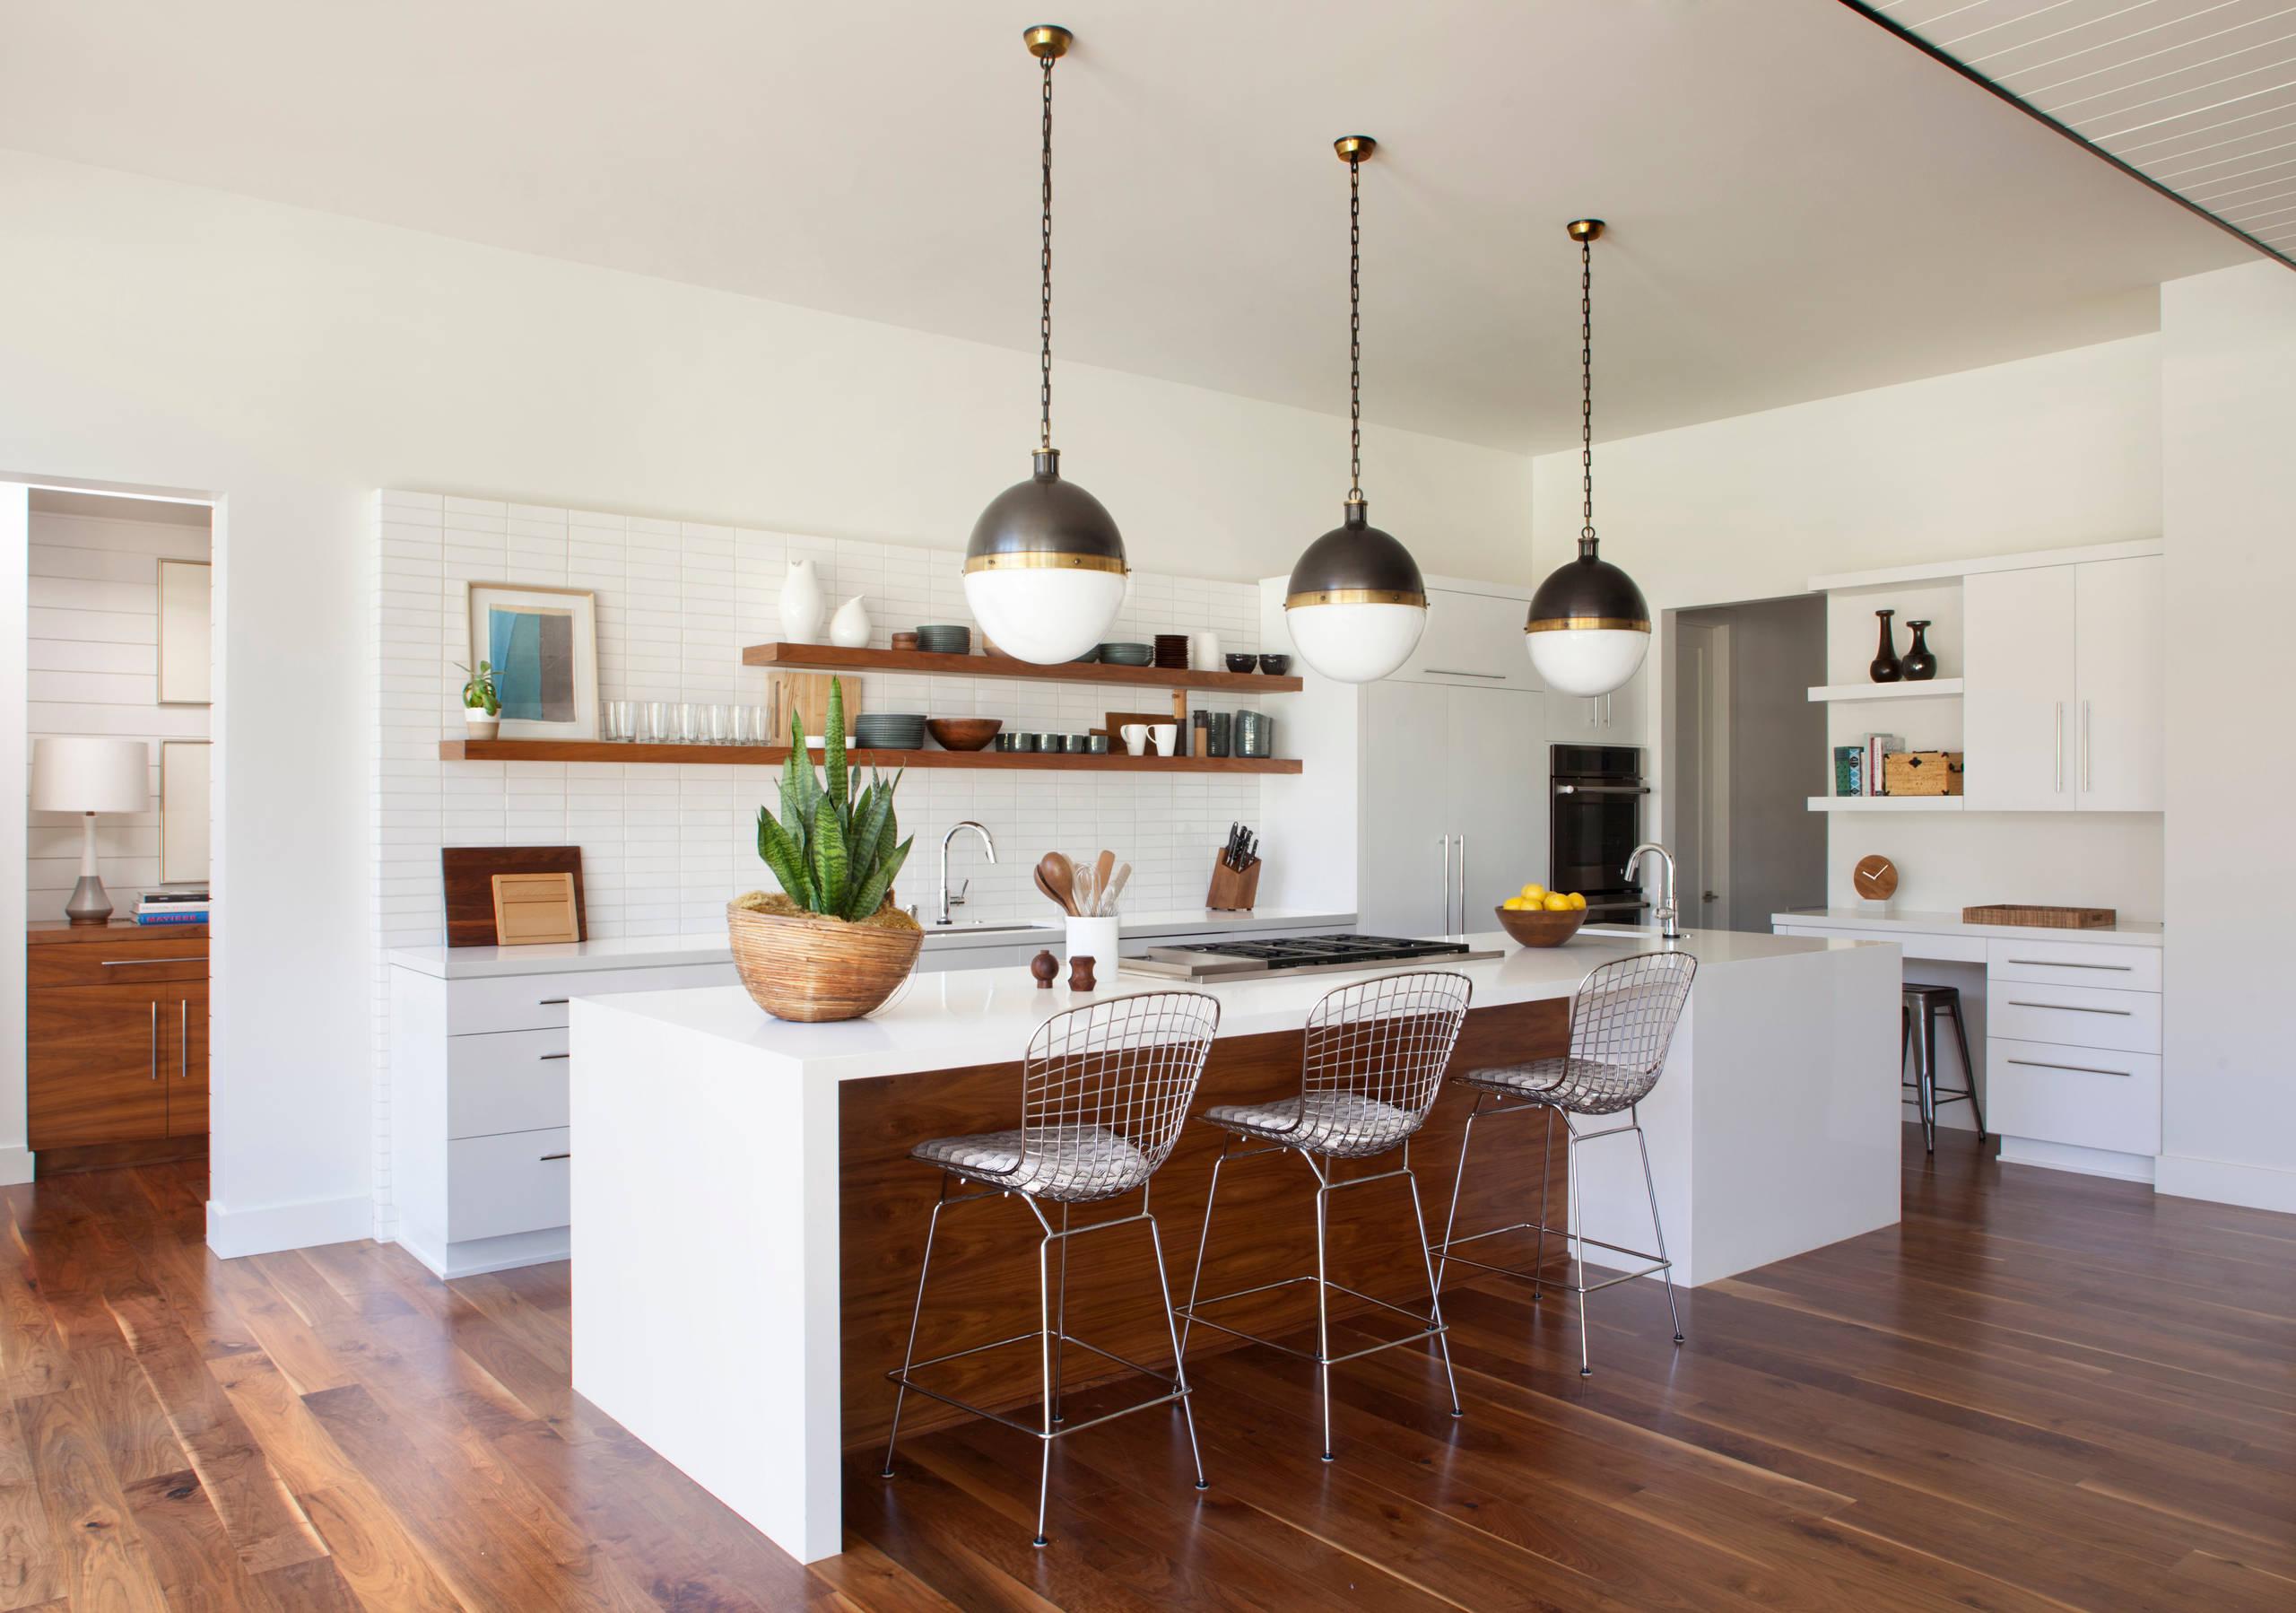 9 Beautiful Mid Century Modern Kitchen Pictures & Ideas   July ...